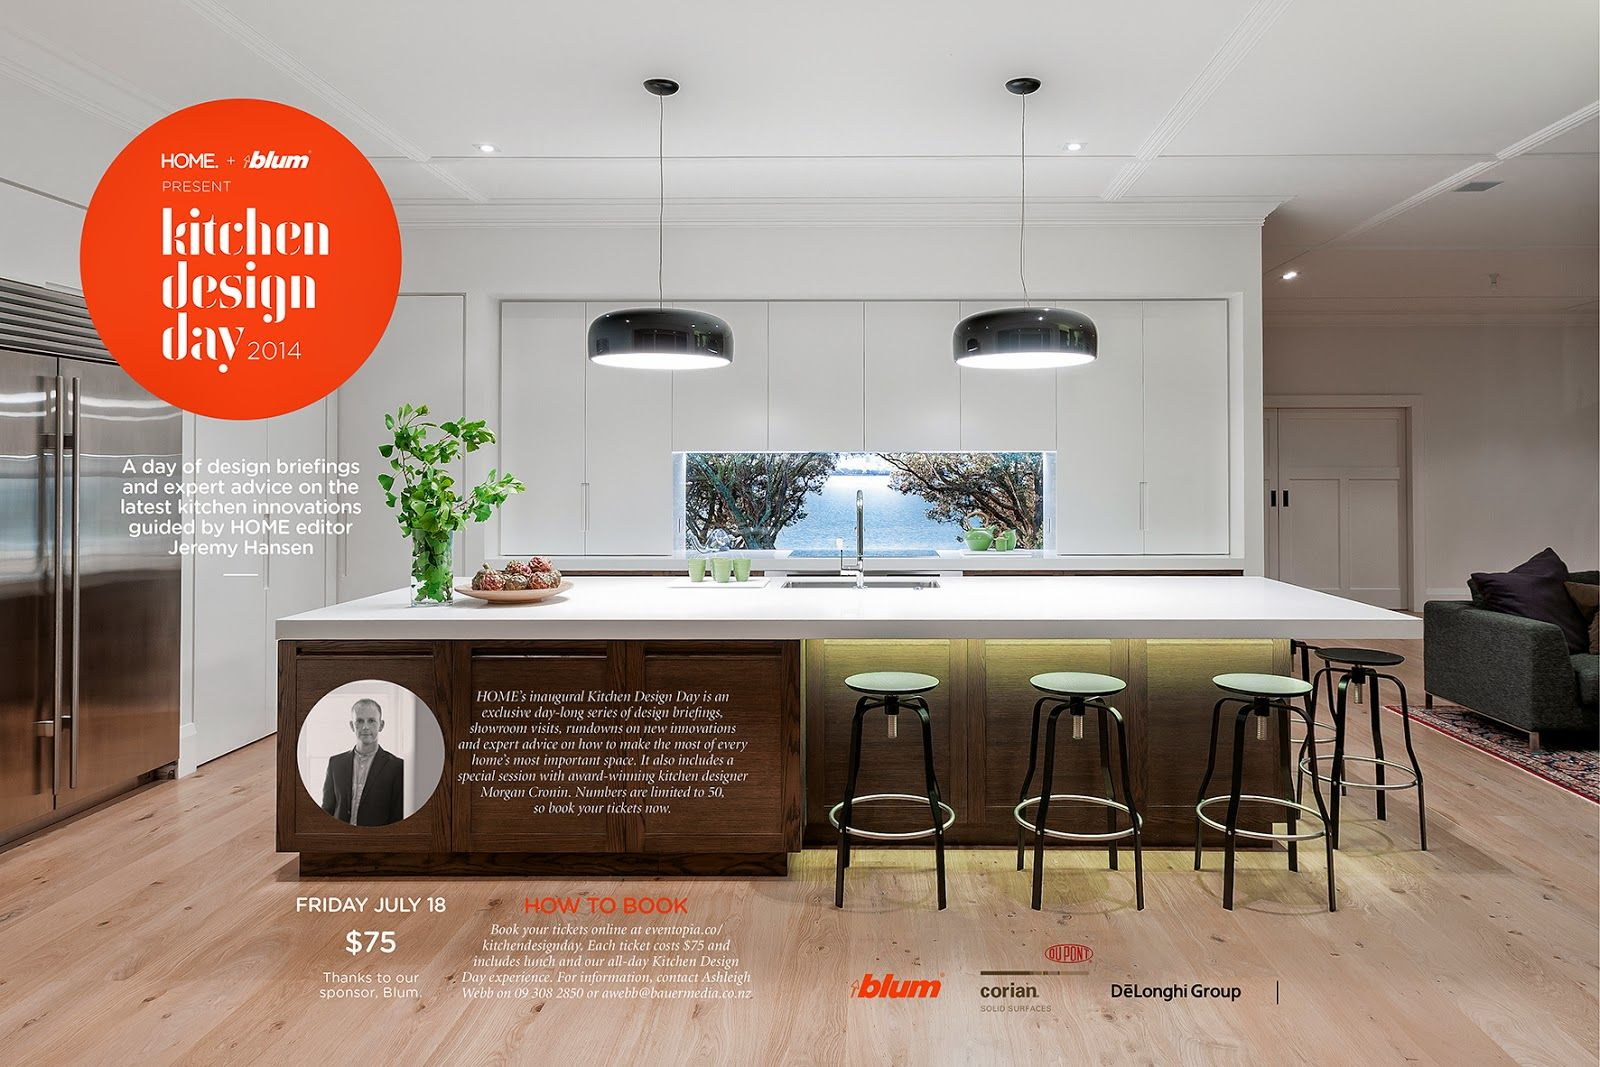 Award Winning Kitchens 2014  Google Search  Kitchen Designs Impressive Interior Design Kitchens 2014 Inspiration